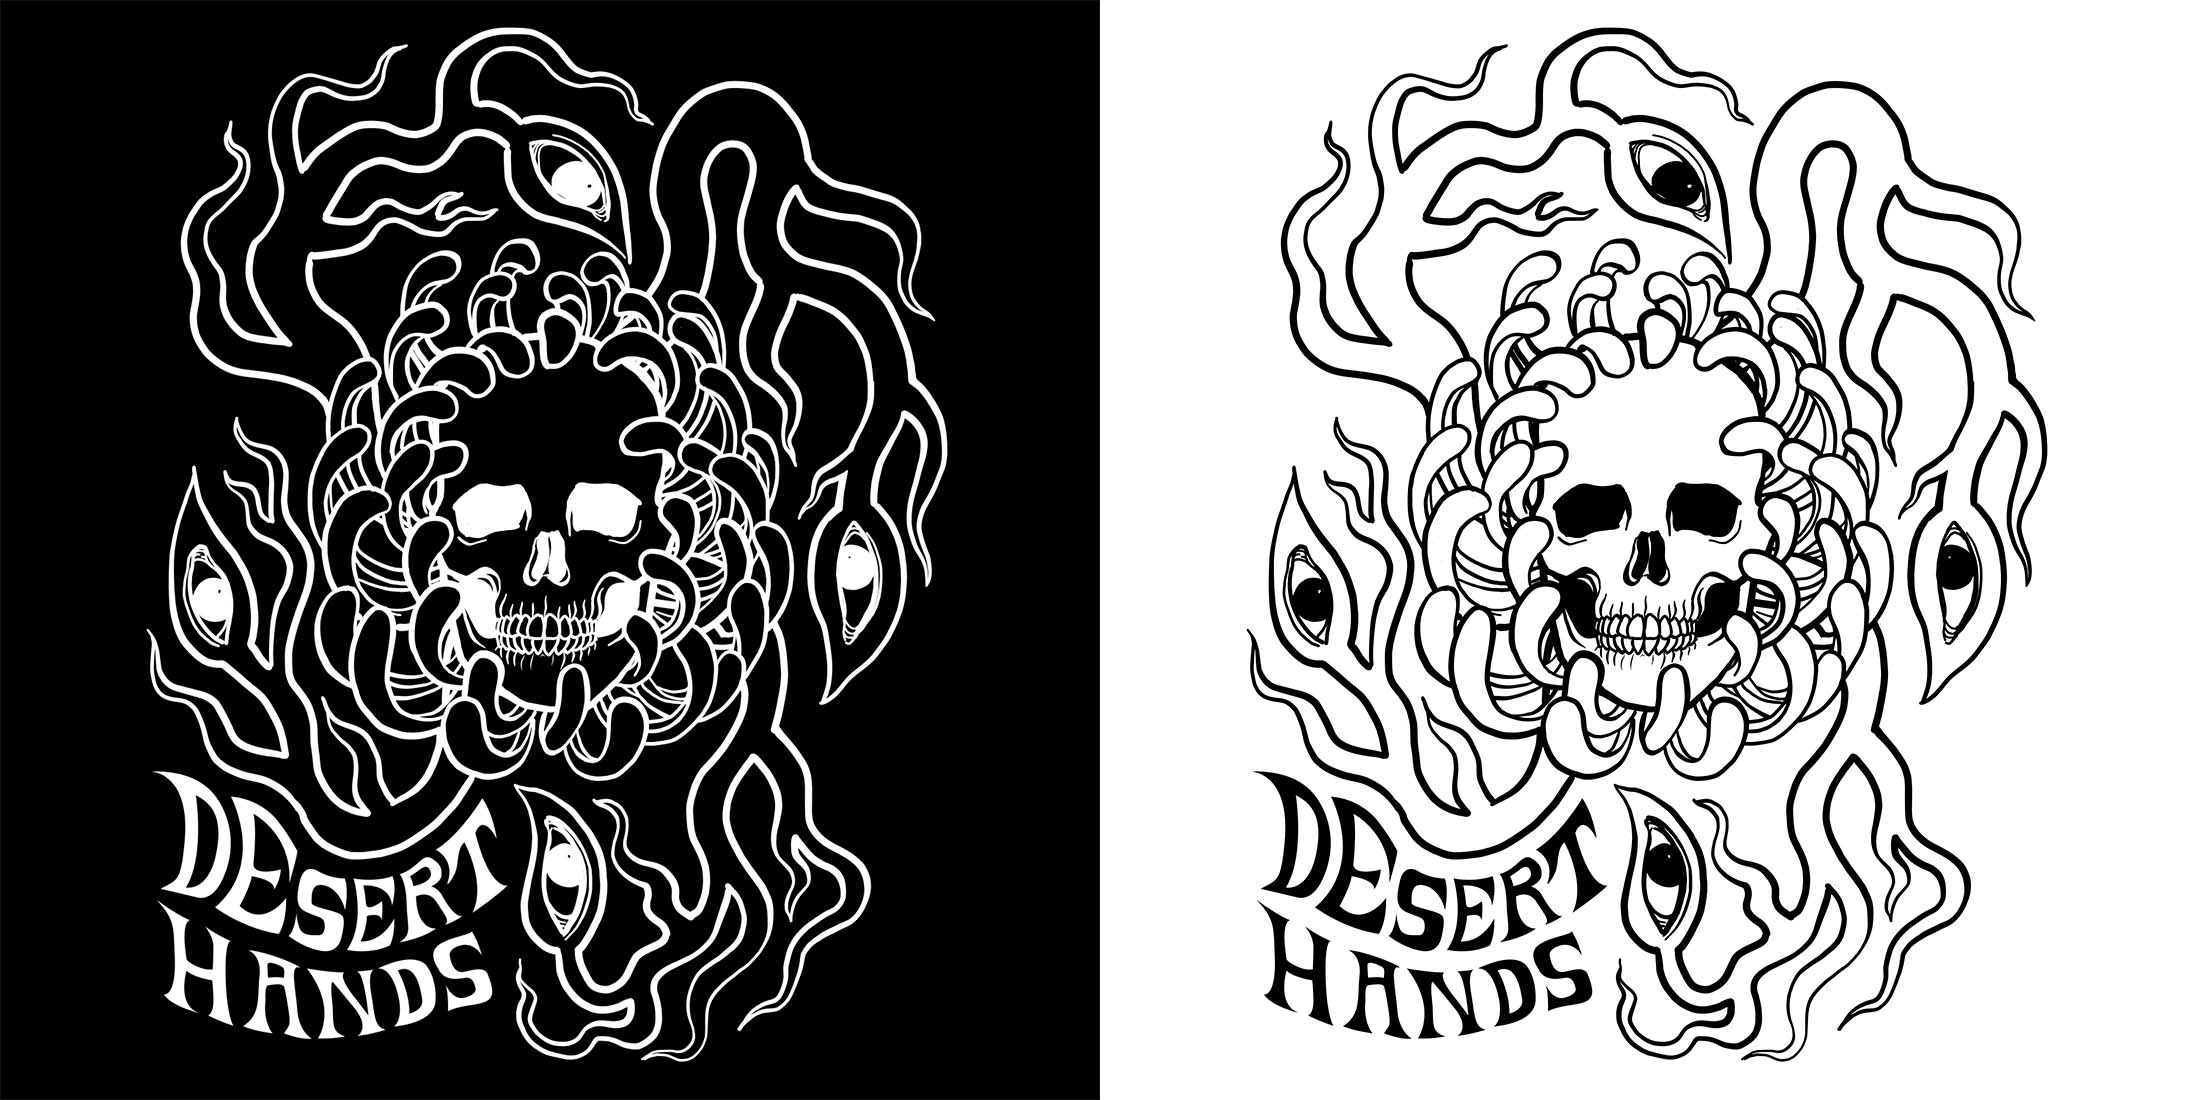 Desert Hands Commission - Front Design.jpg